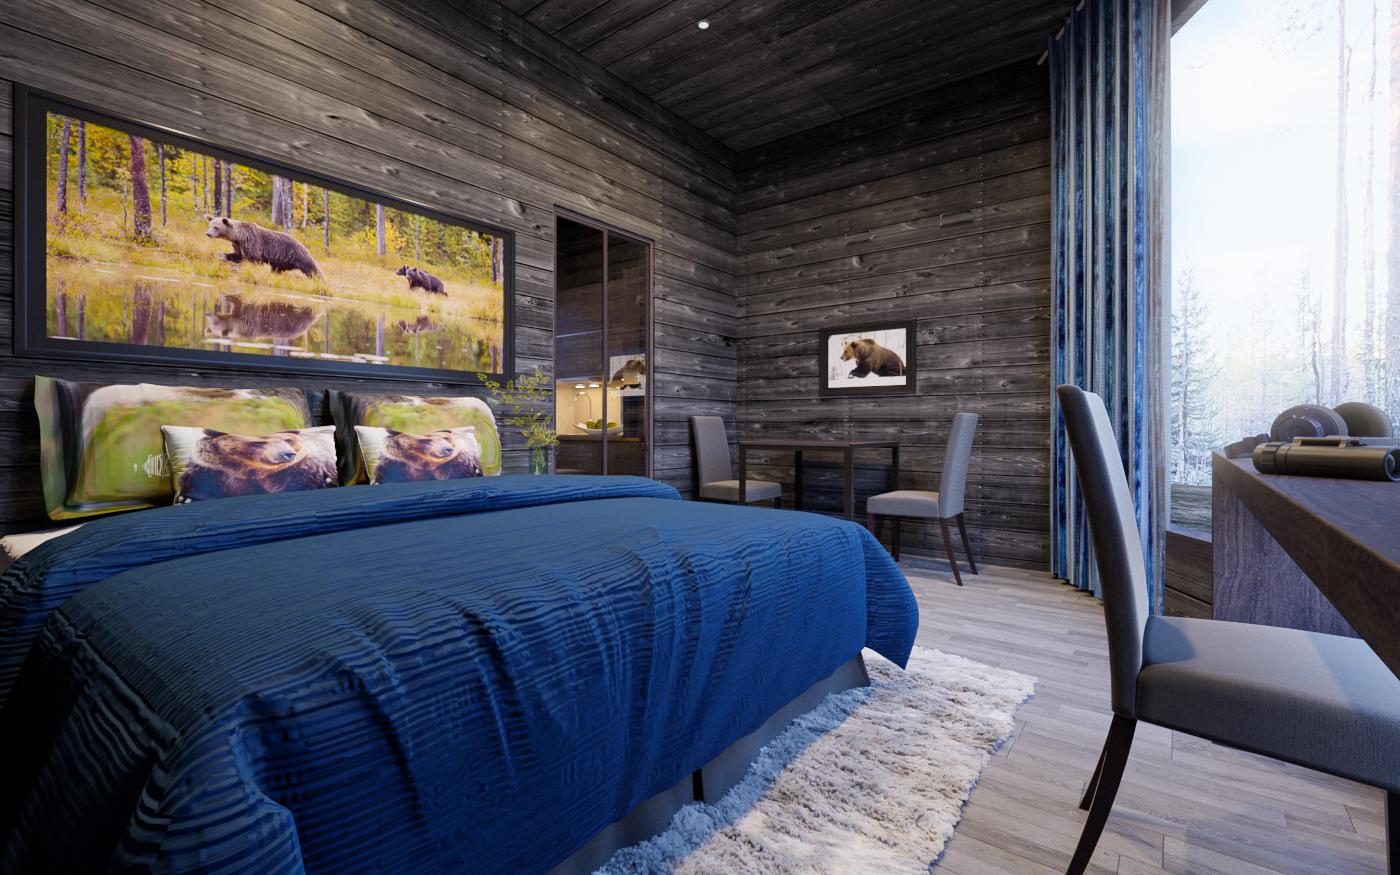 Luxury bear cabin - Финляндия. Идите лесом!